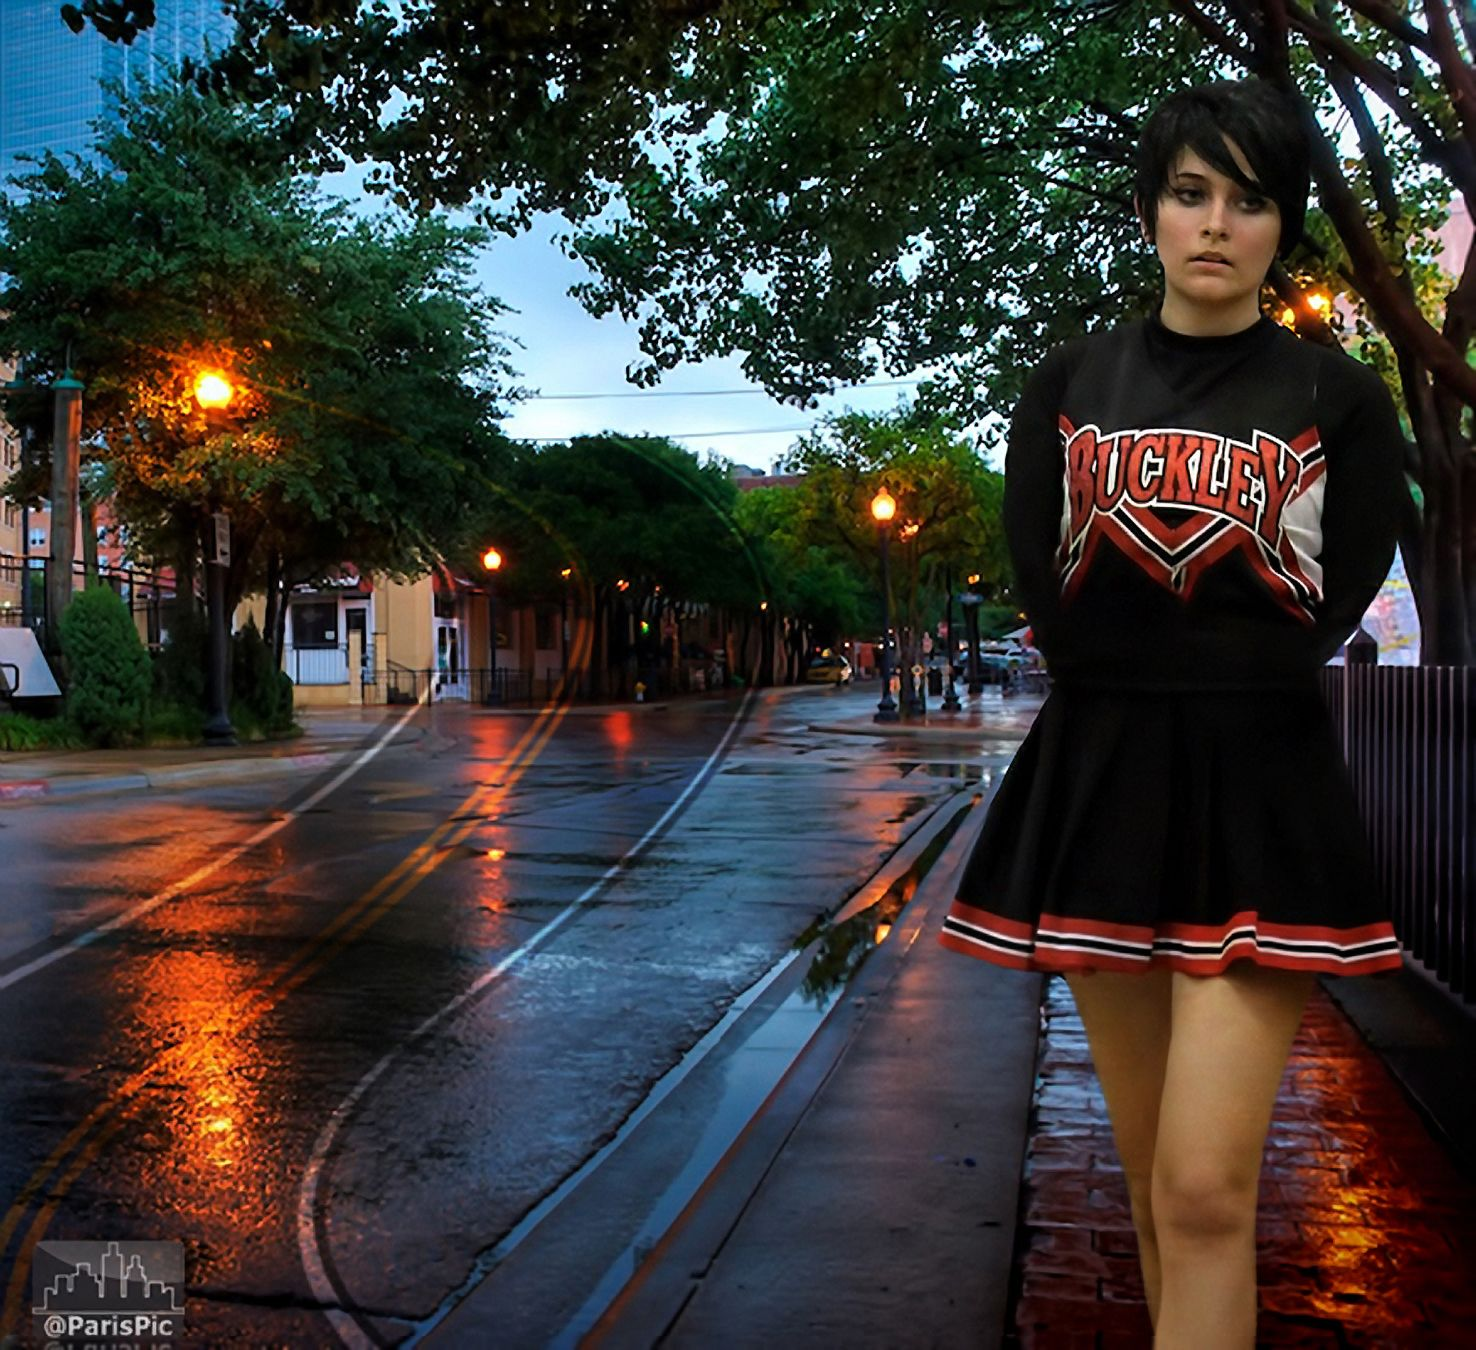 Paris Jackson Lonely Cheerleader (@ParisPic)